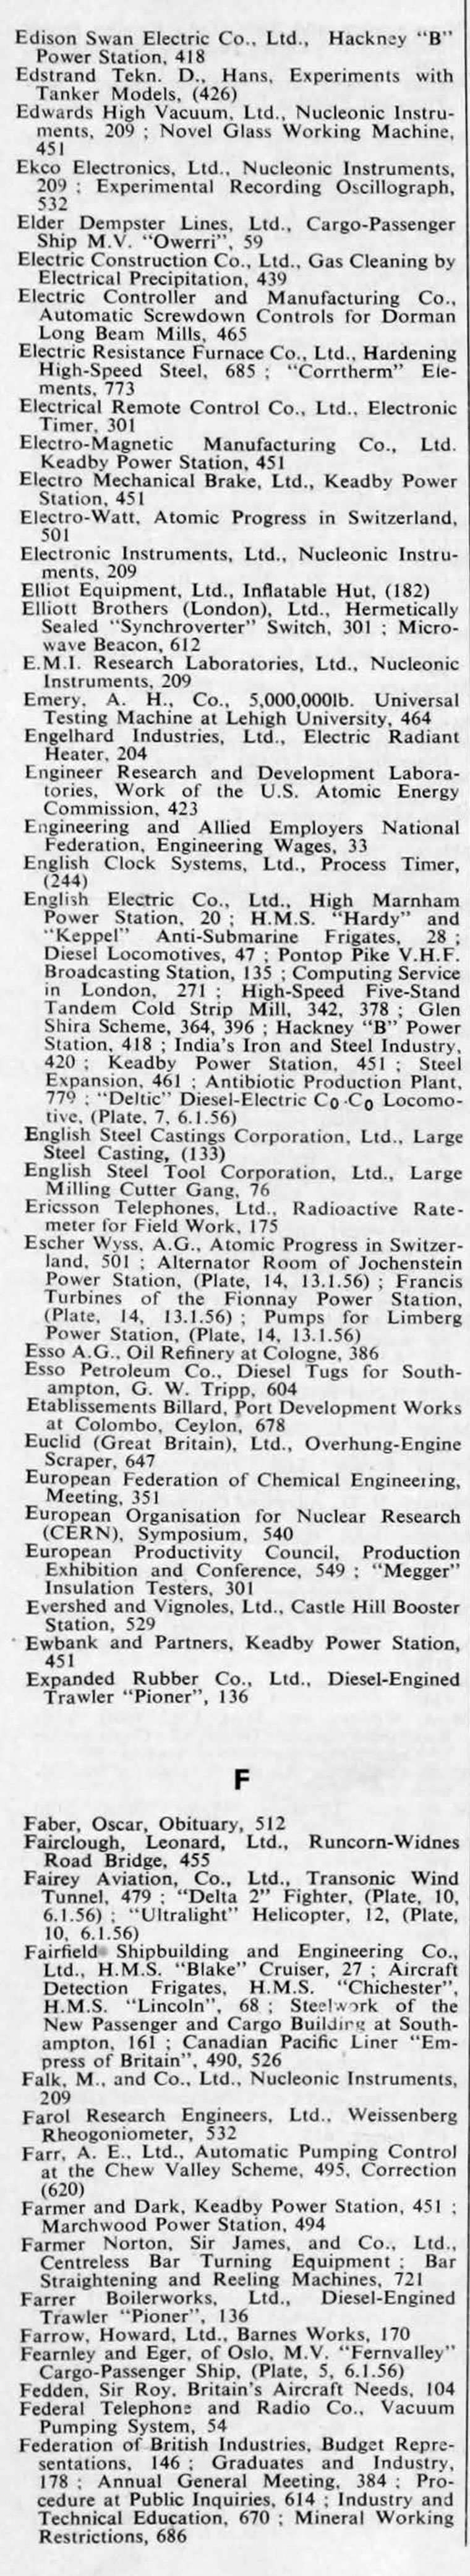 The Engineer 1956 Jan Jun Index